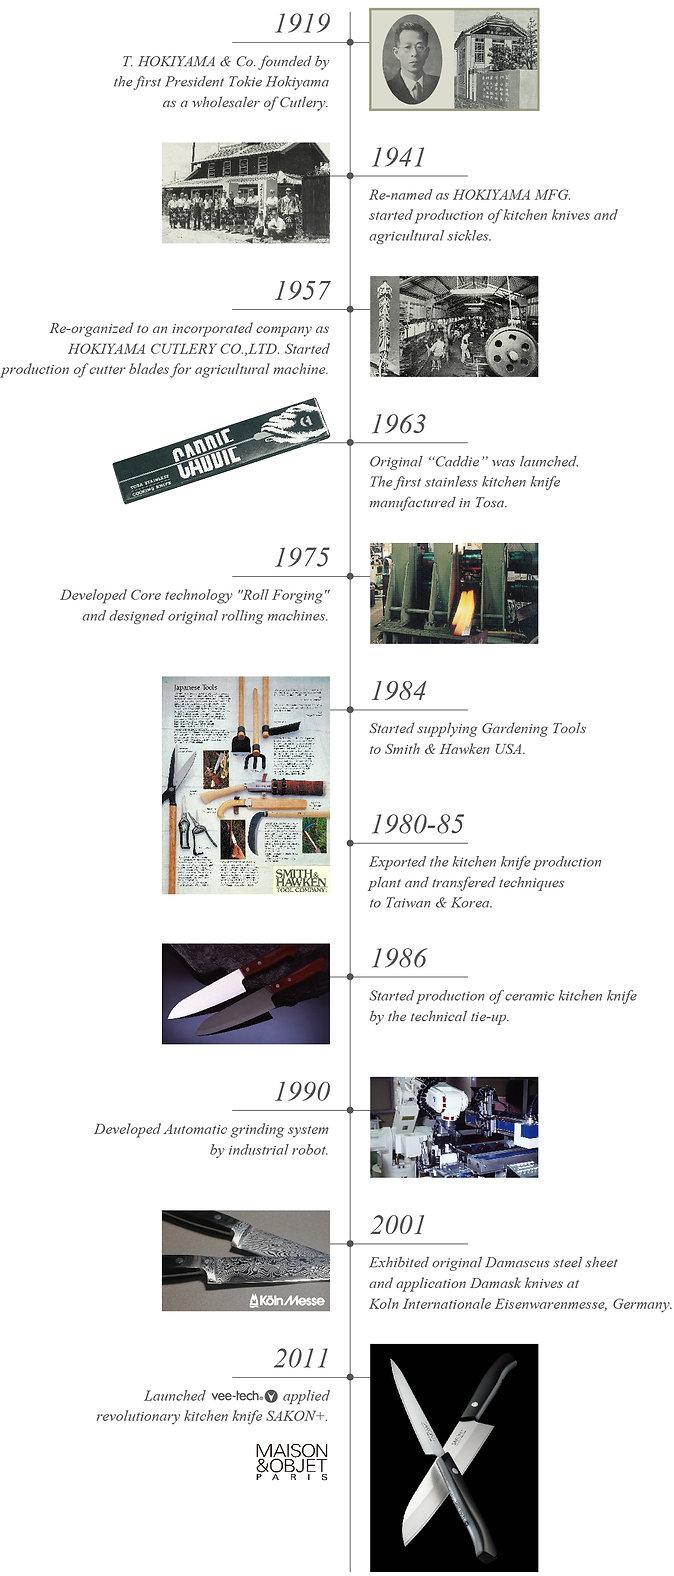 History of Hokiyama Cutlery